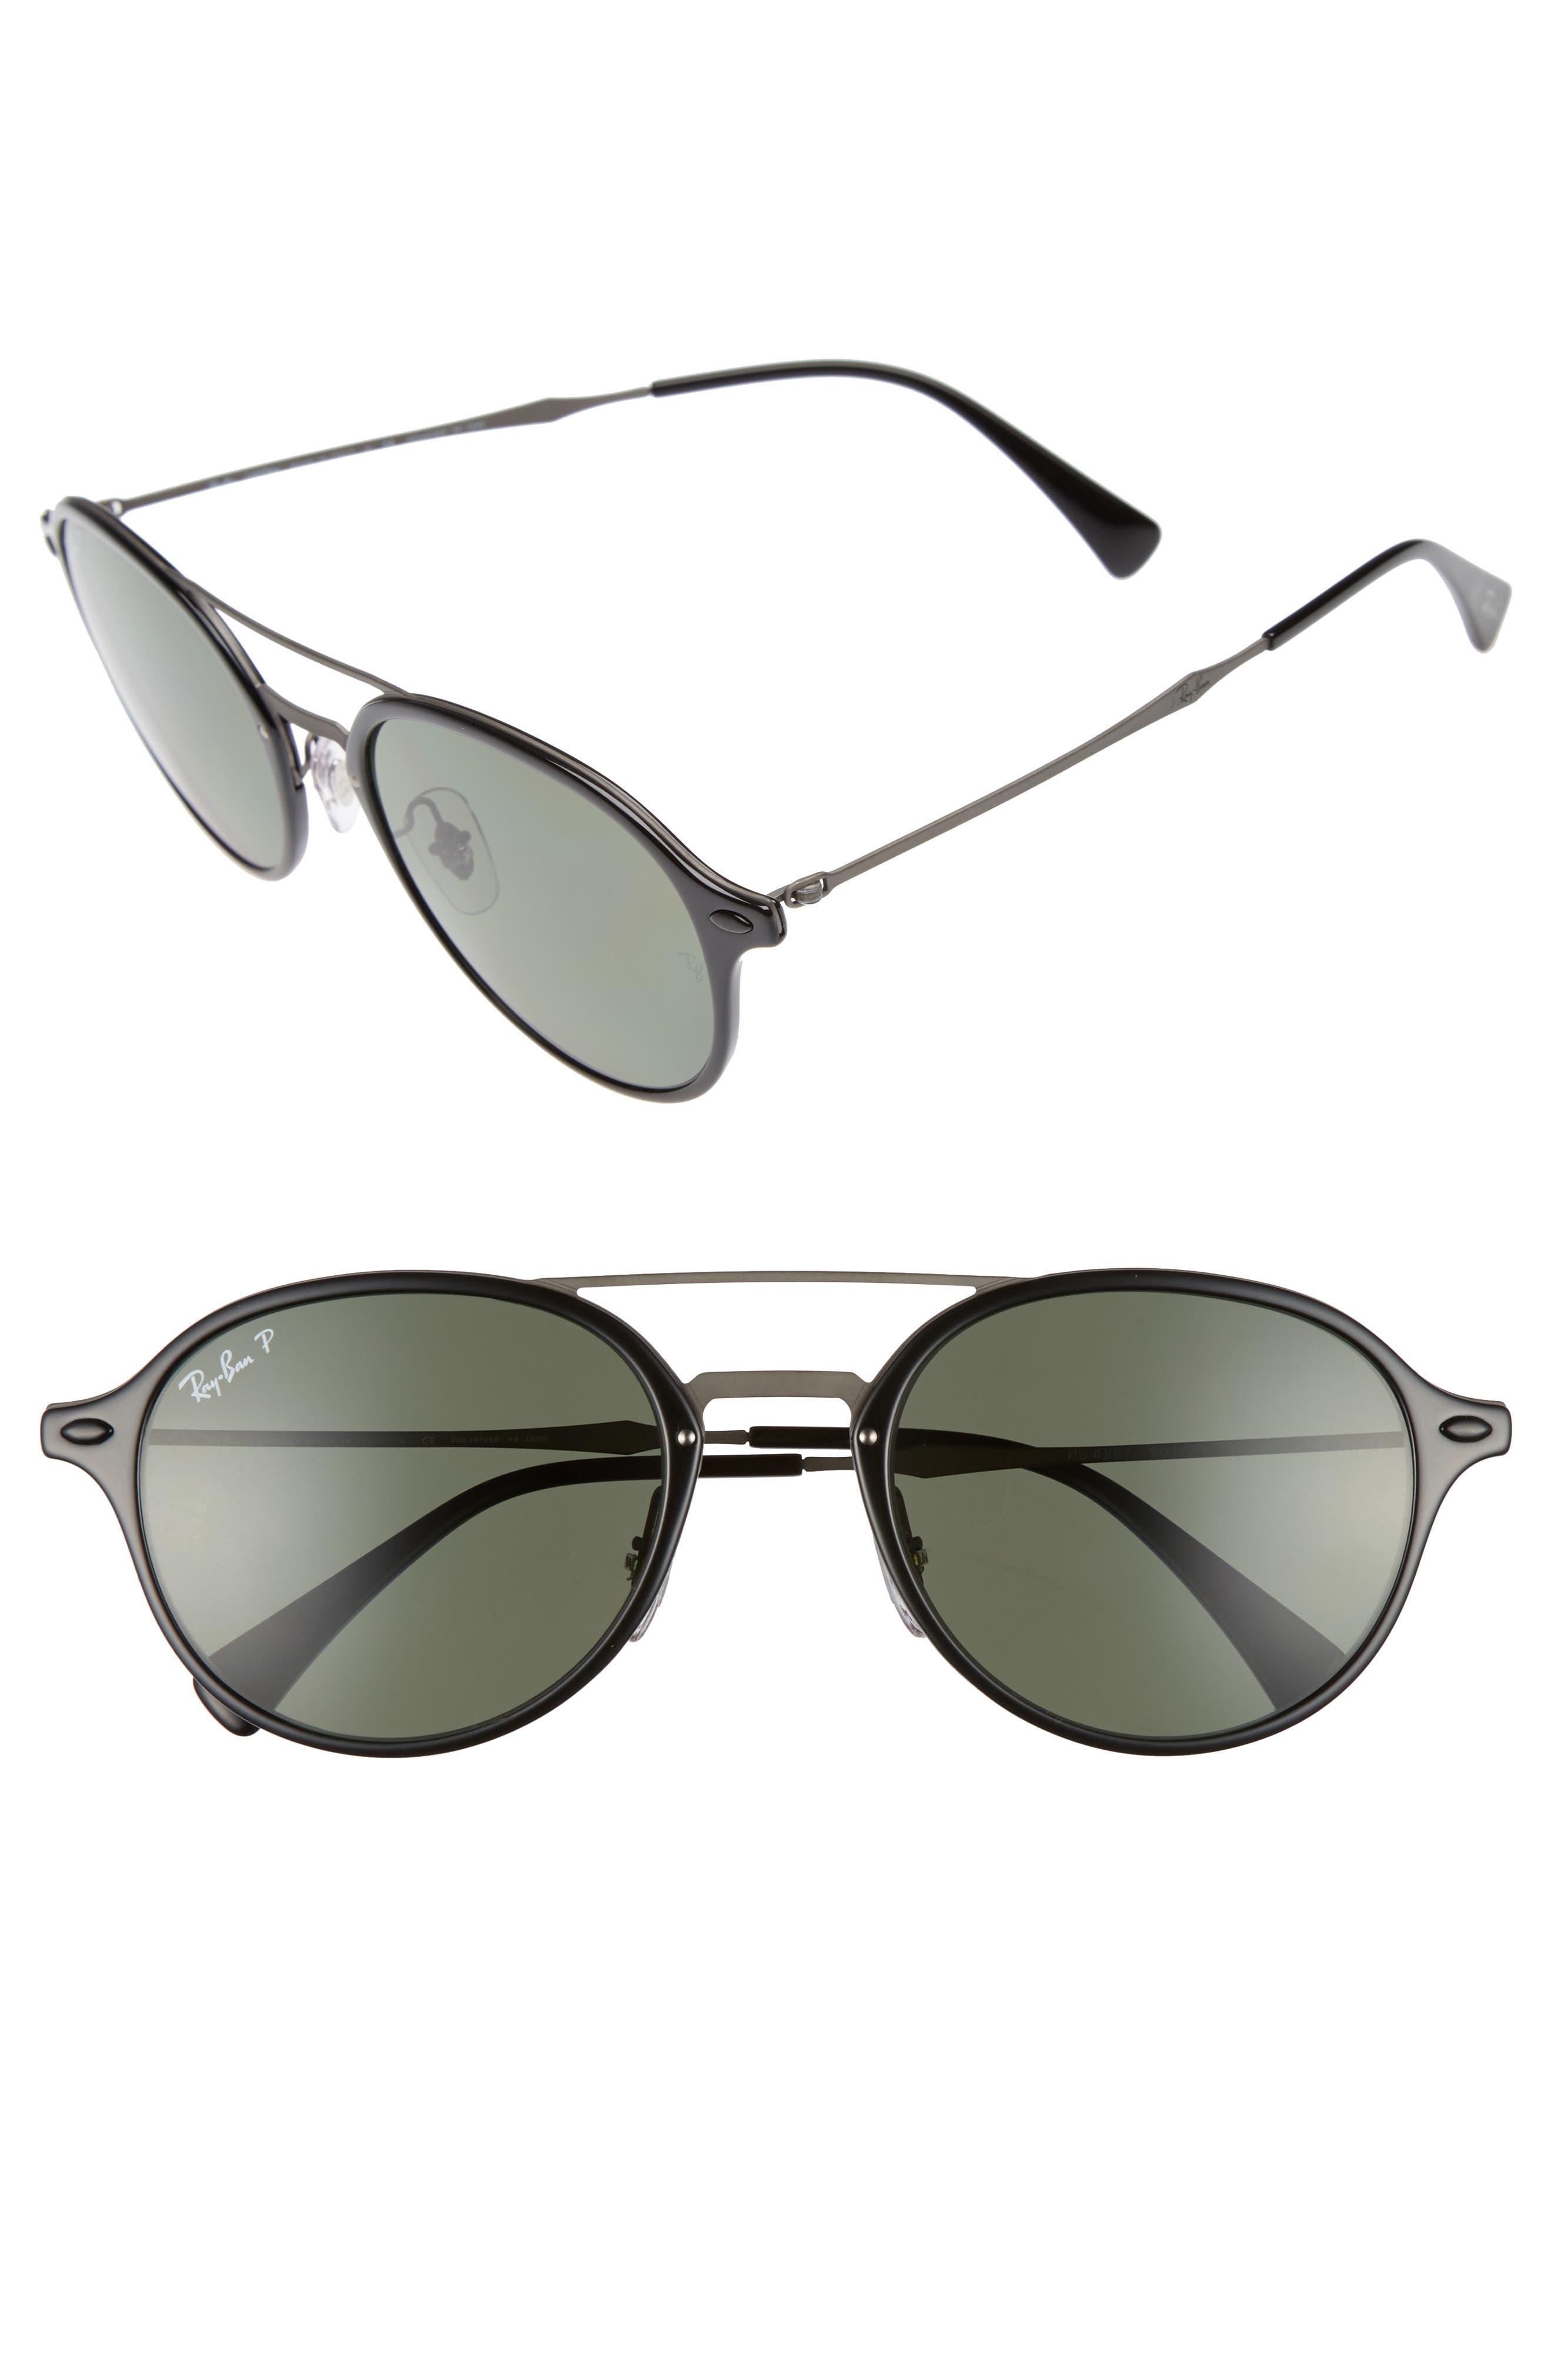 55mm Aviator Sunglasses,                         Main,                         color, Black